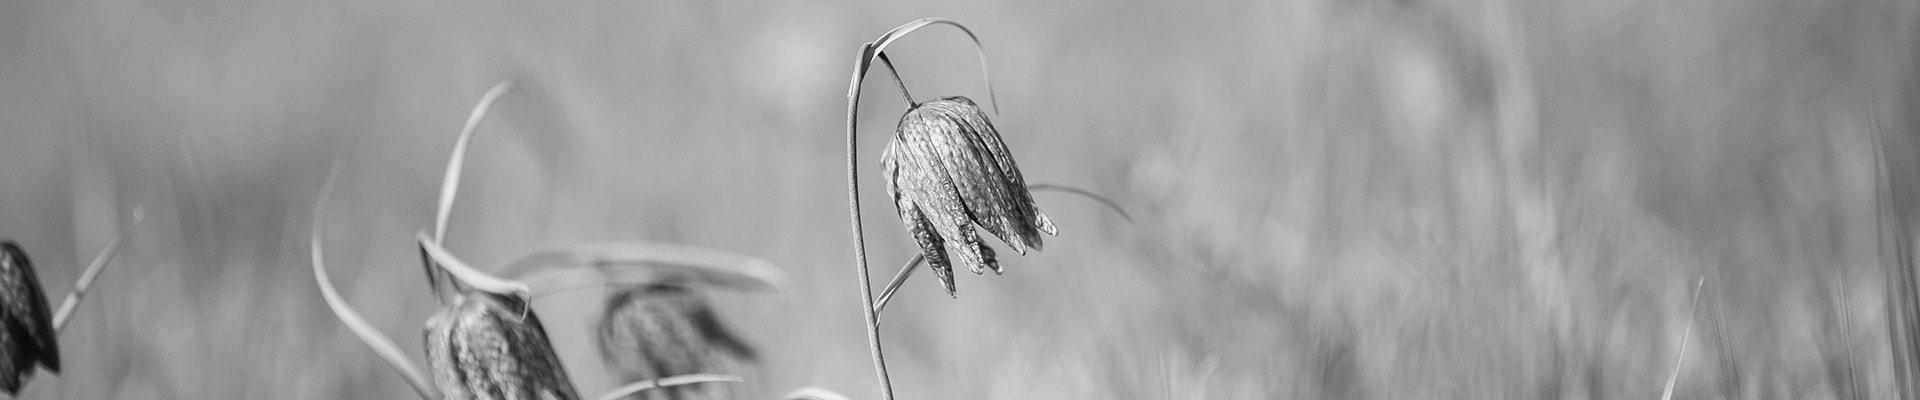 Blomma svartvit